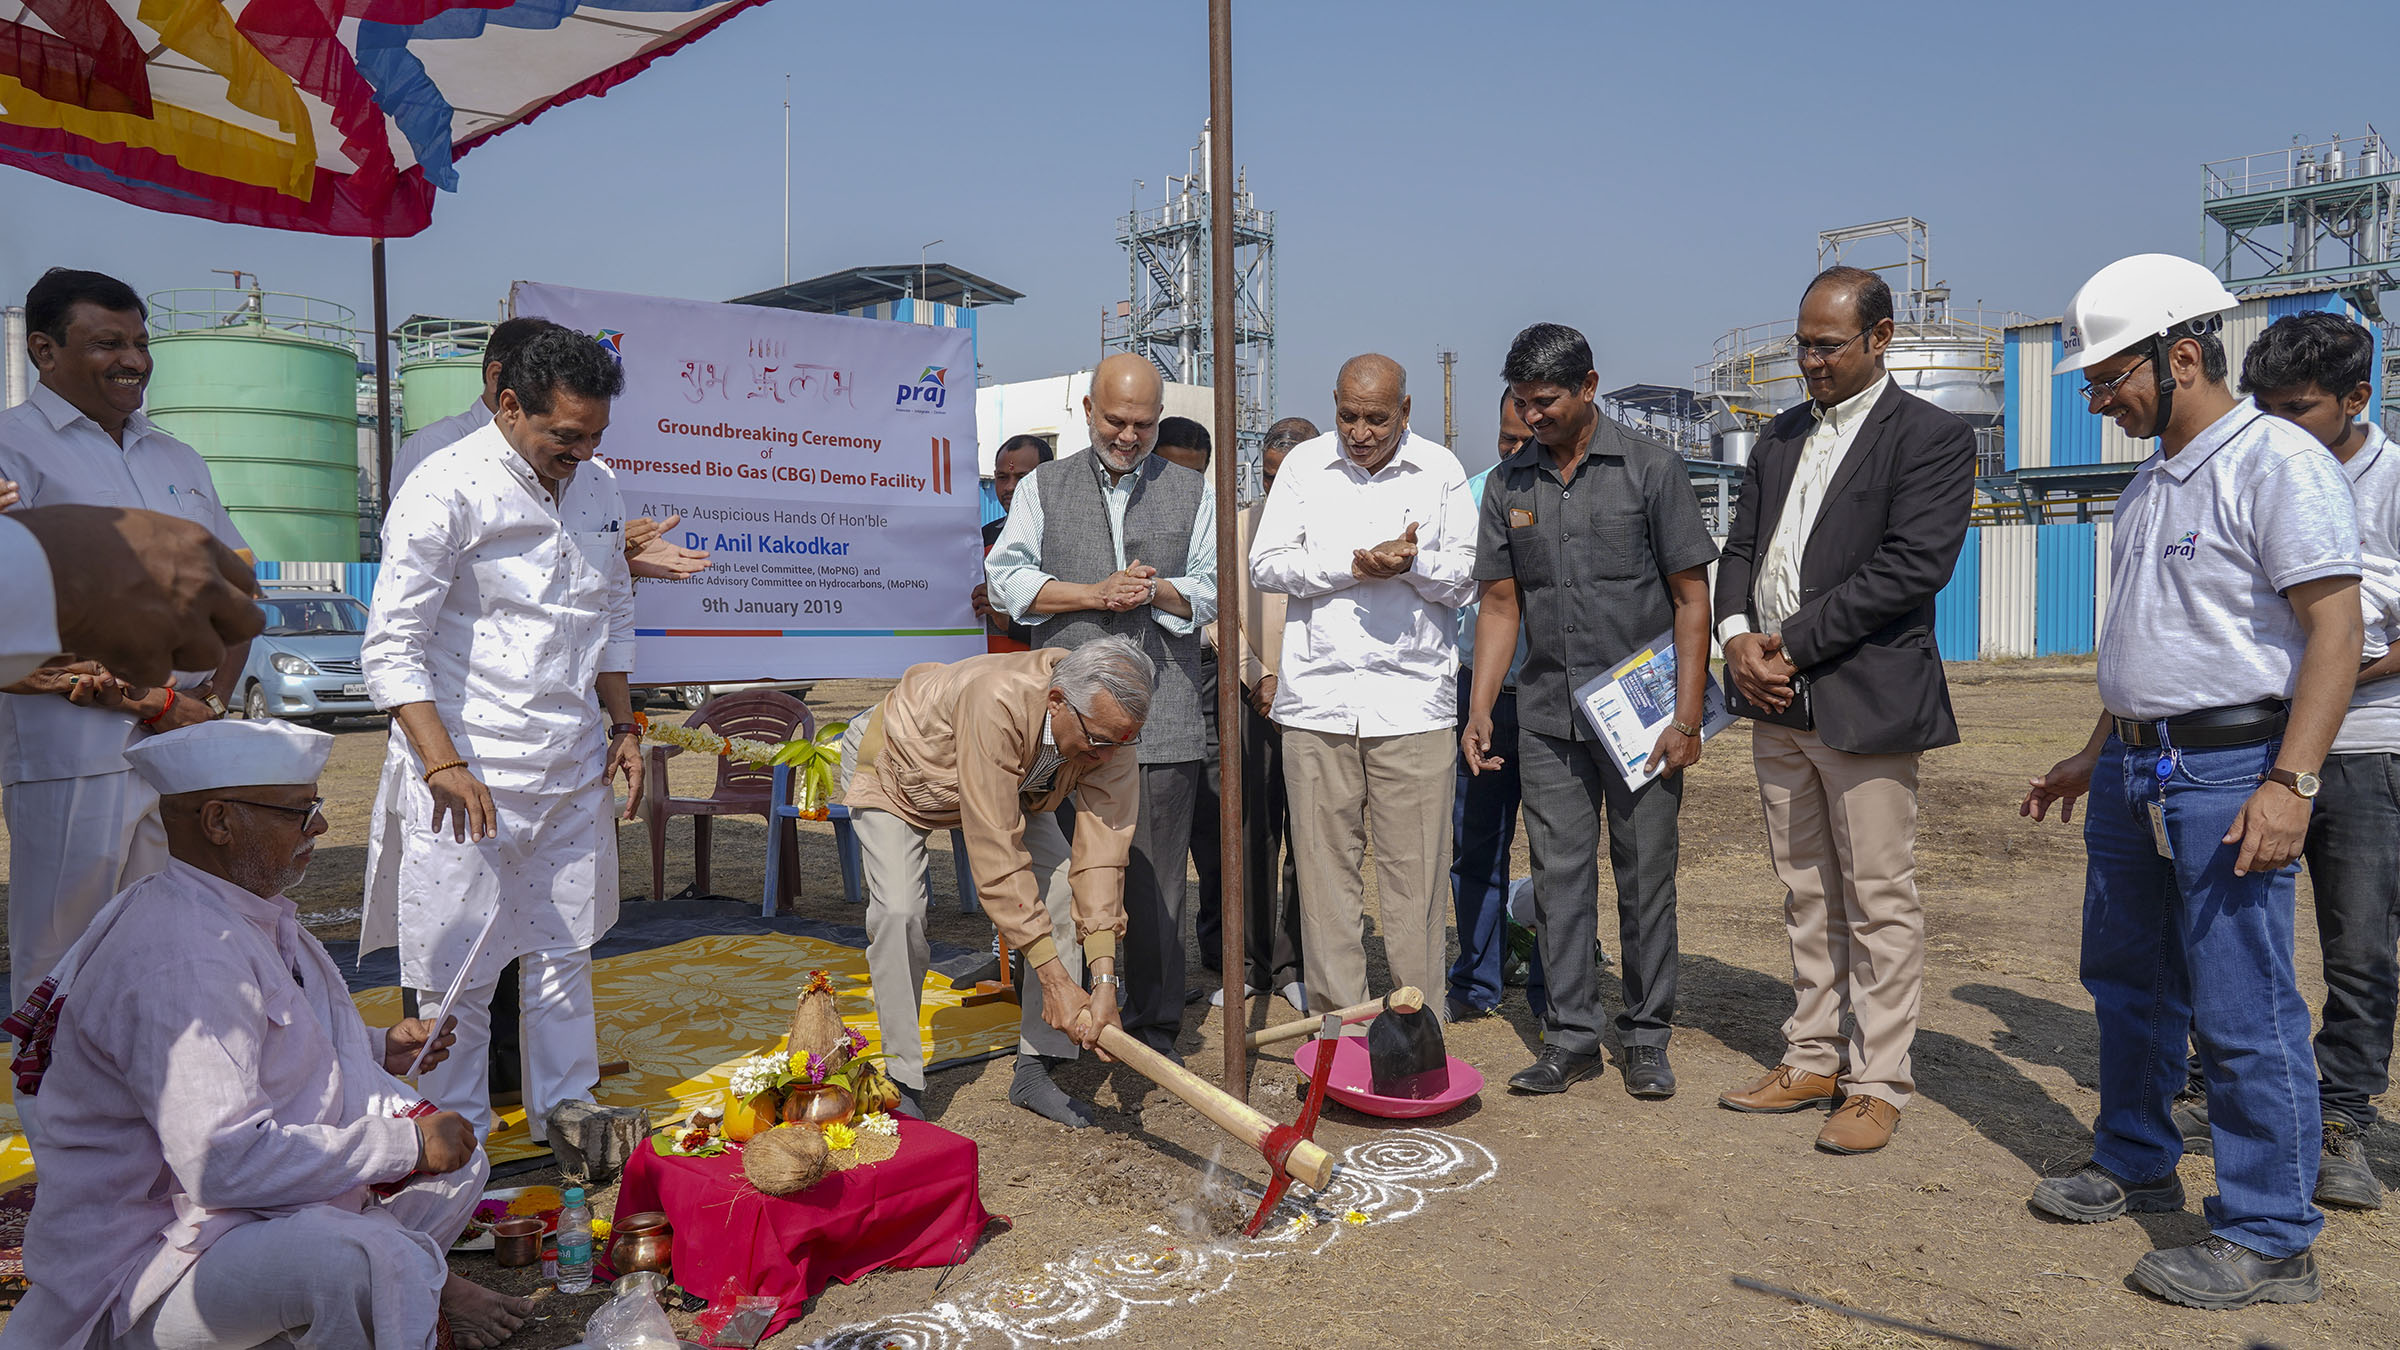 Praj Industries Announced Ground-Breaking of Integrated Demo